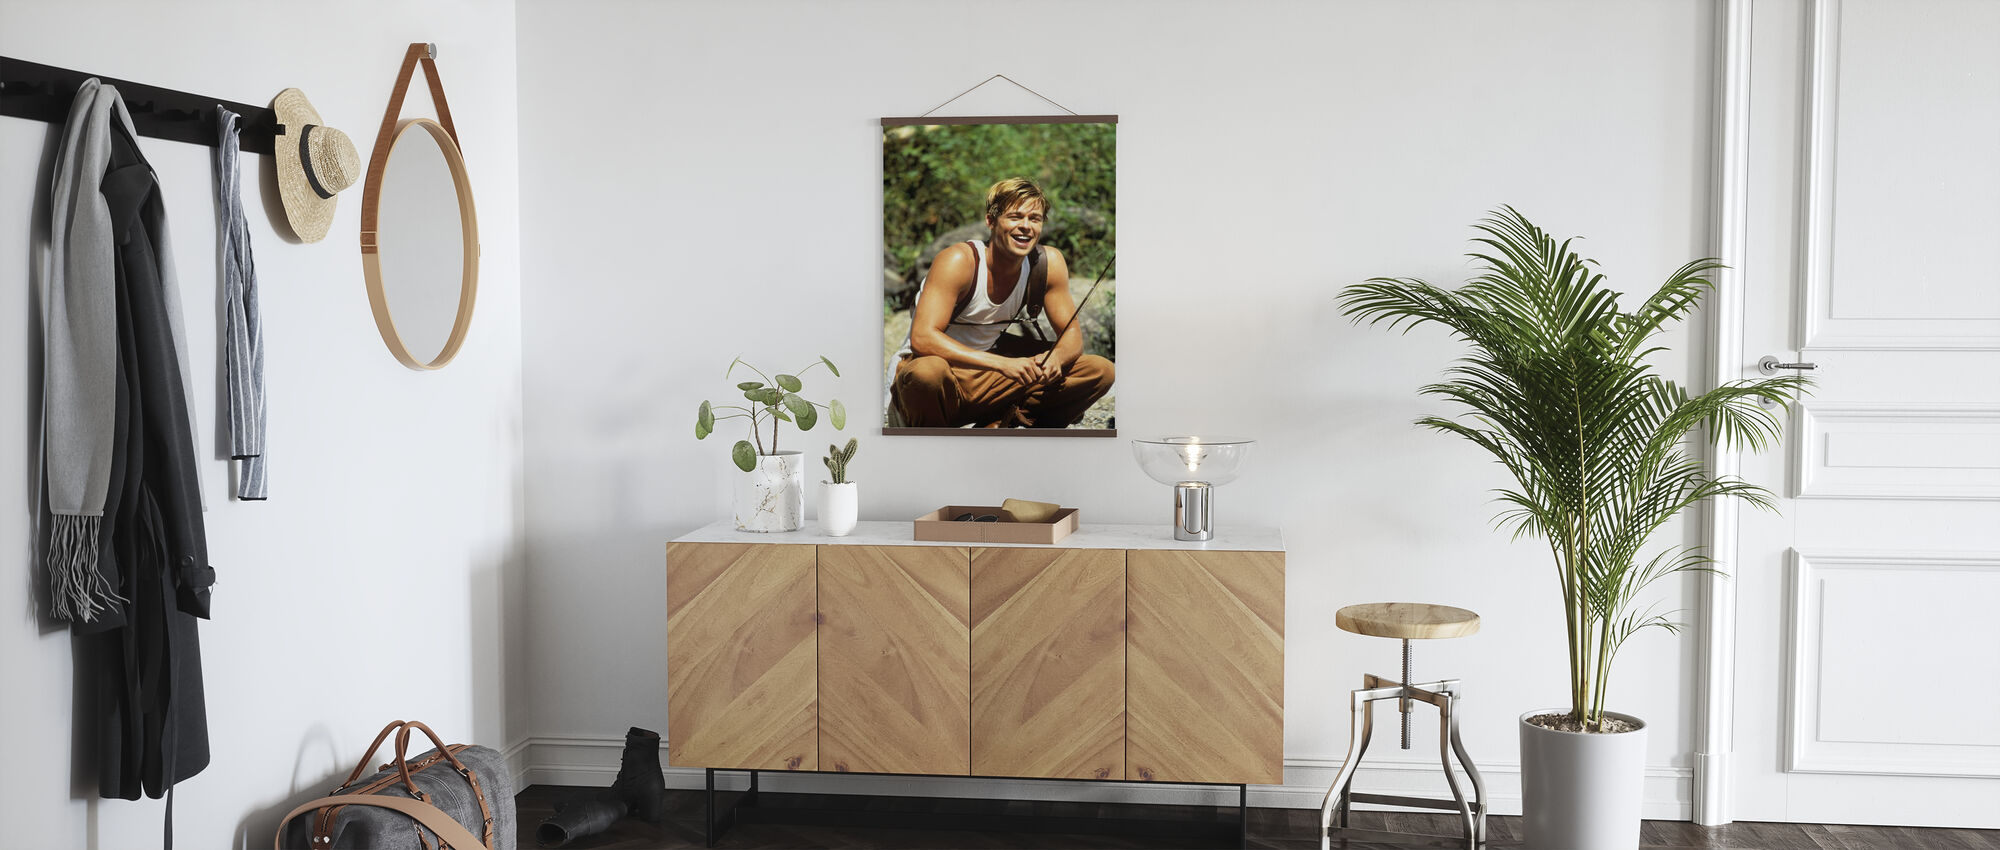 Fiske - Brad Pitt - Poster - Hall